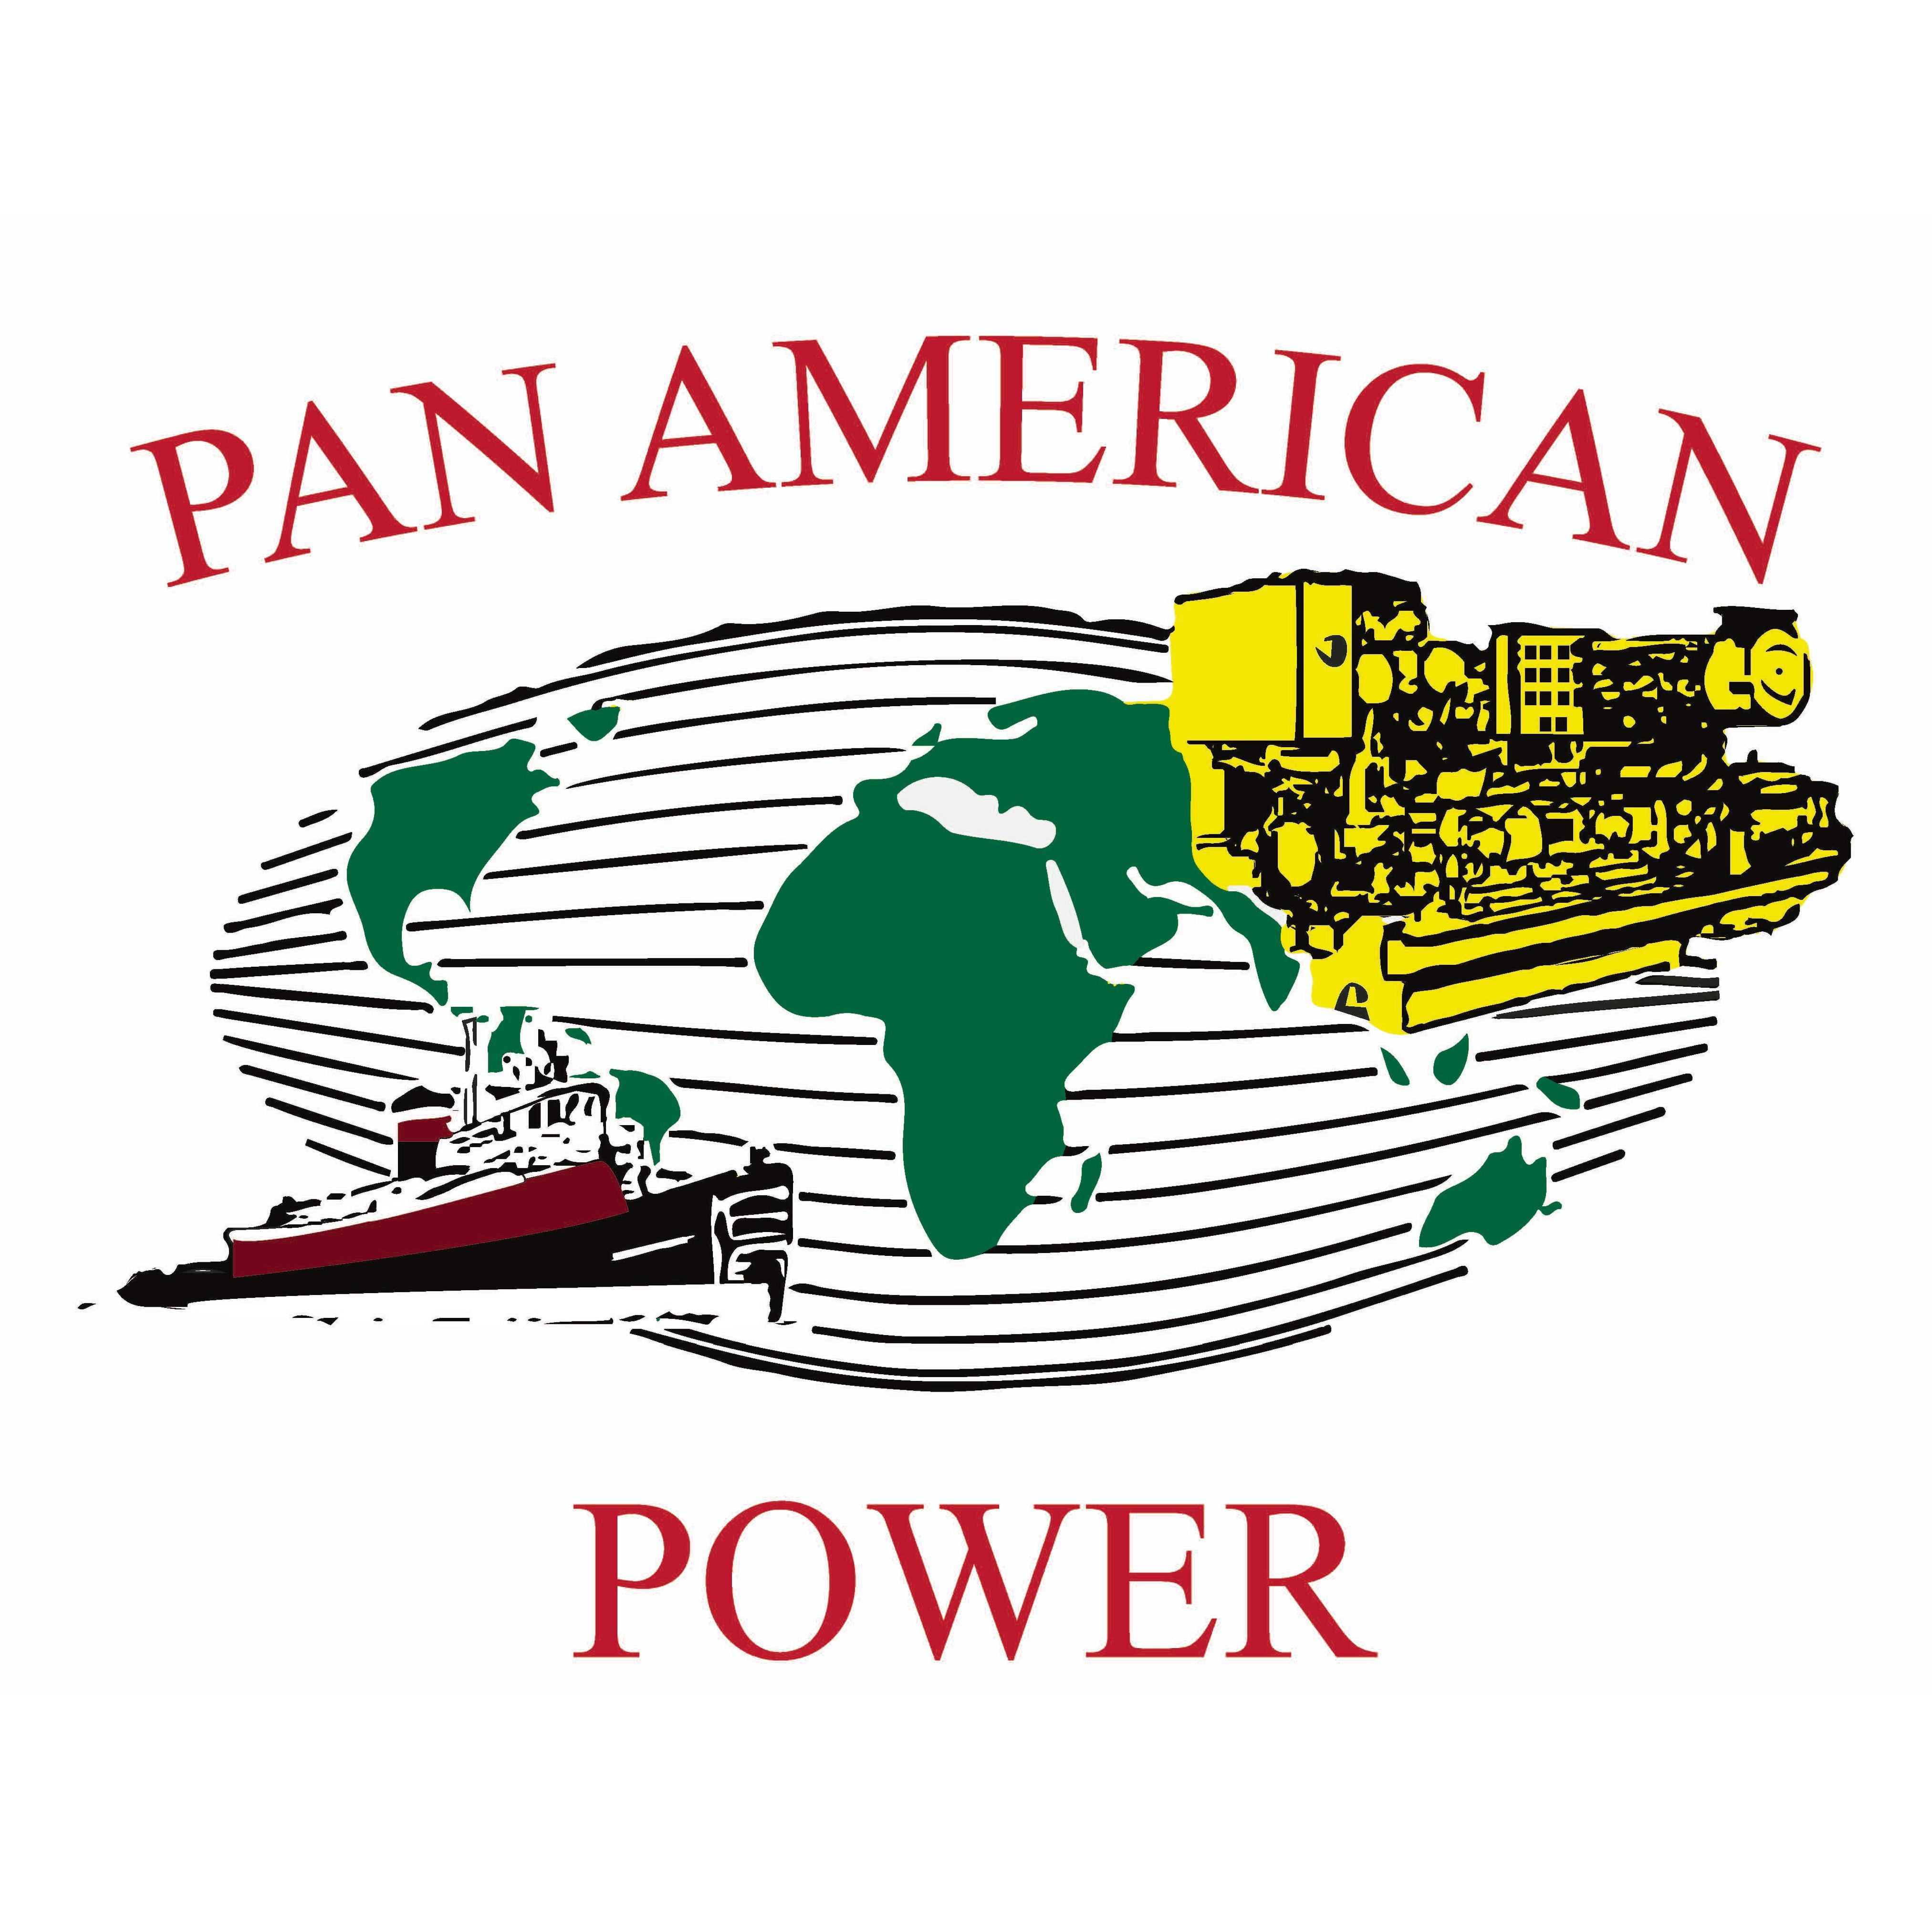 Pan American Power - Covington, LA 70435 - (985)893-1271 | ShowMeLocal.com